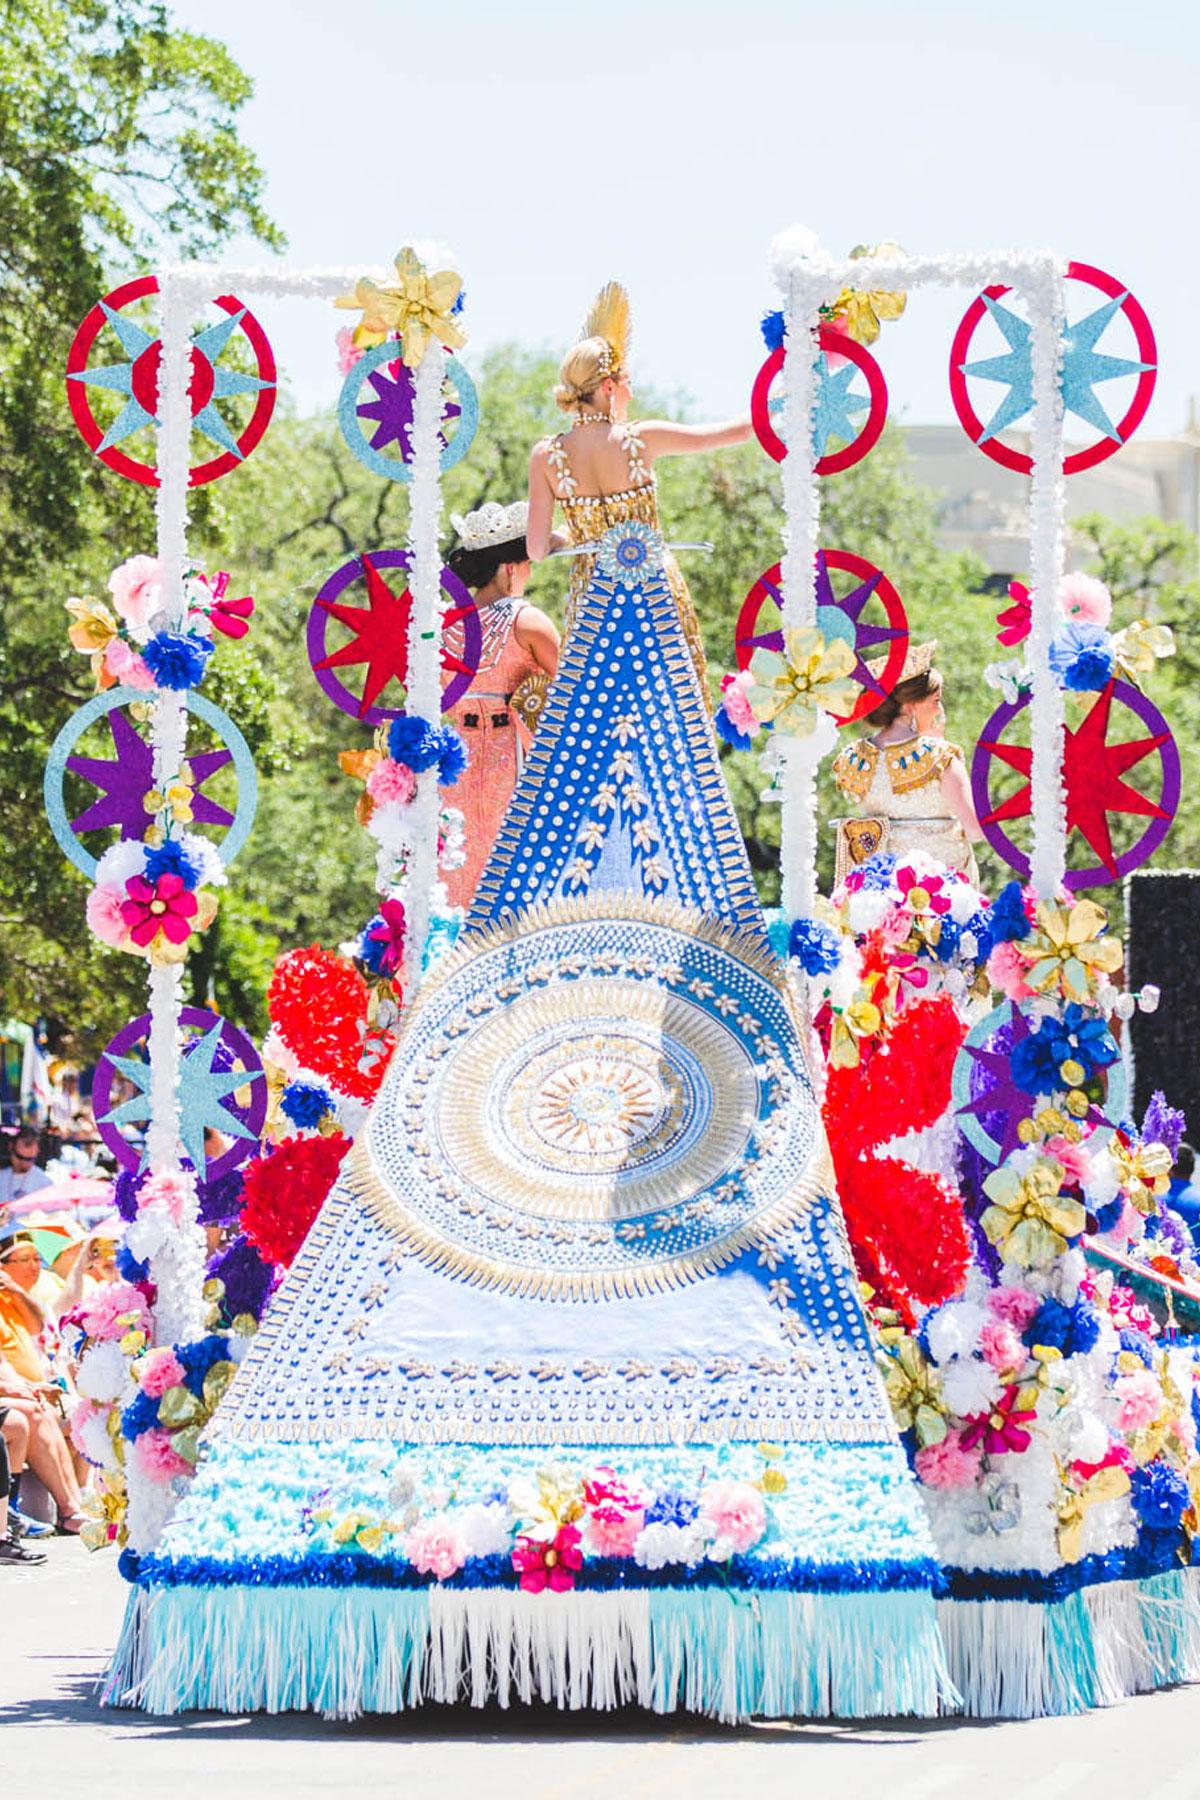 San Antonio Coming Together Virtually to Celebrate Fiesta®